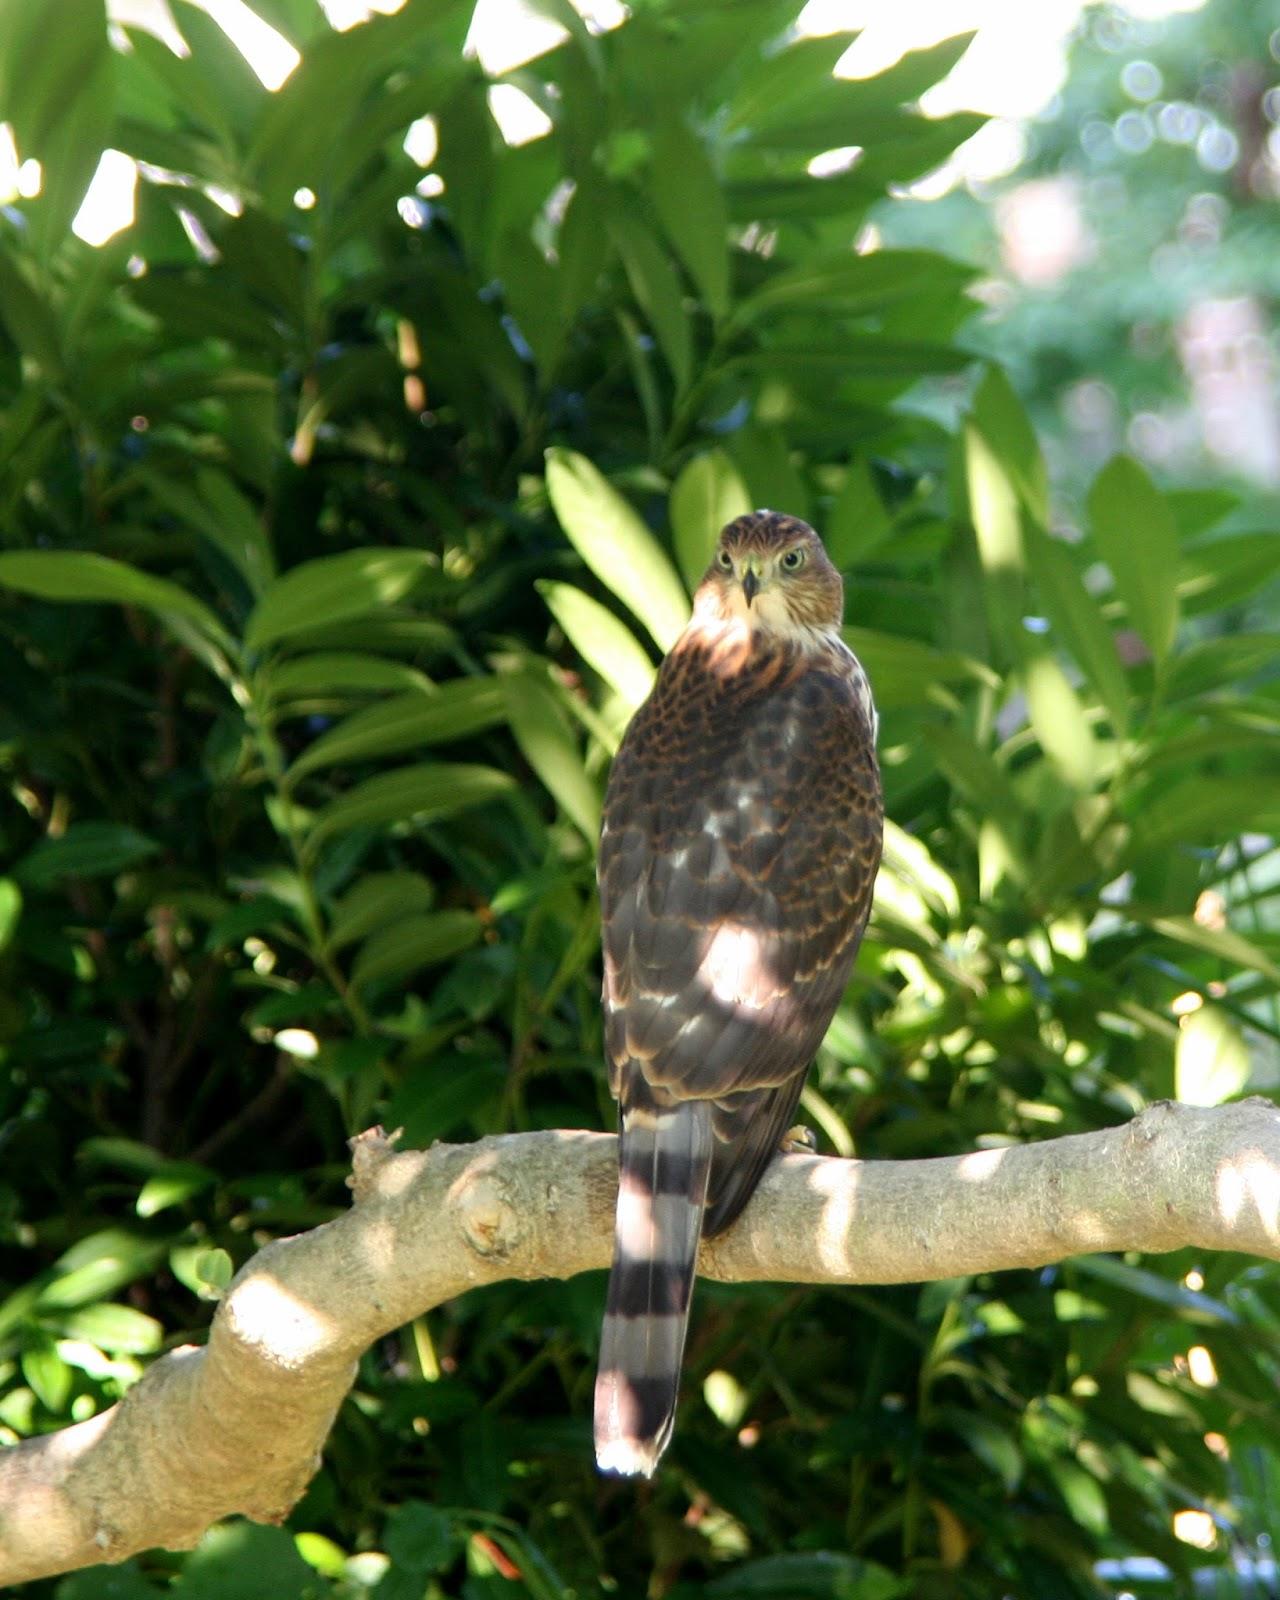 world bird sanctuary september 2013